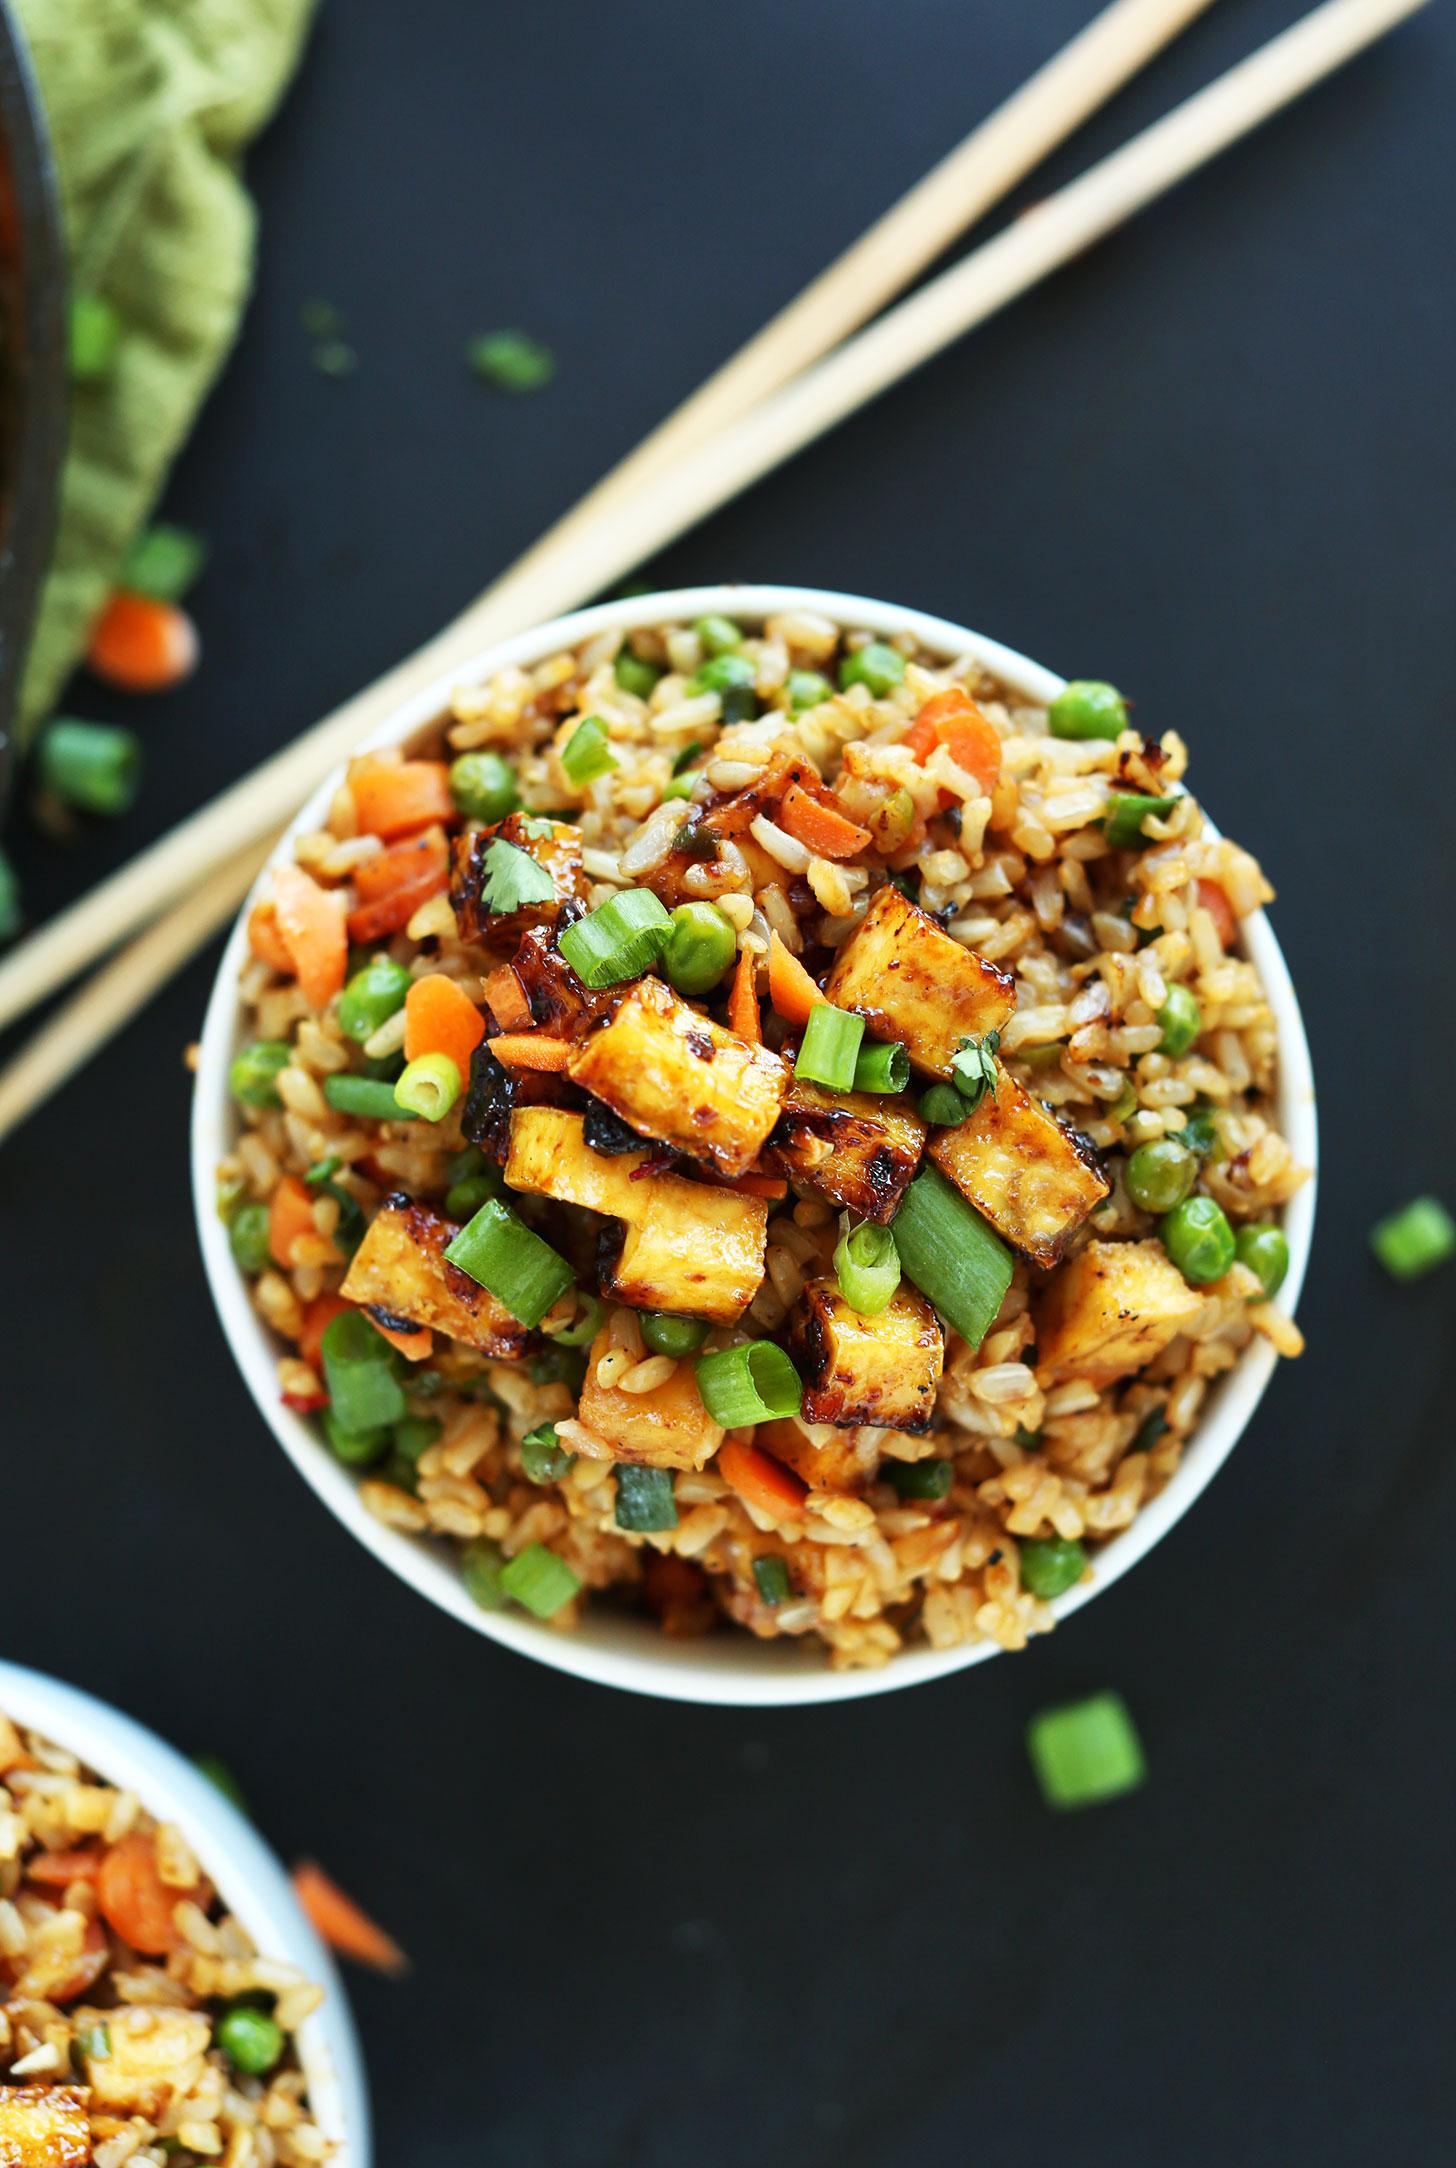 AMAZING-HEALTHY-Vegan-Fried-Rice-with-Crispy-Tofu-vegan-glutenfree-recipe-chinese-friedrice-minimalistbaker